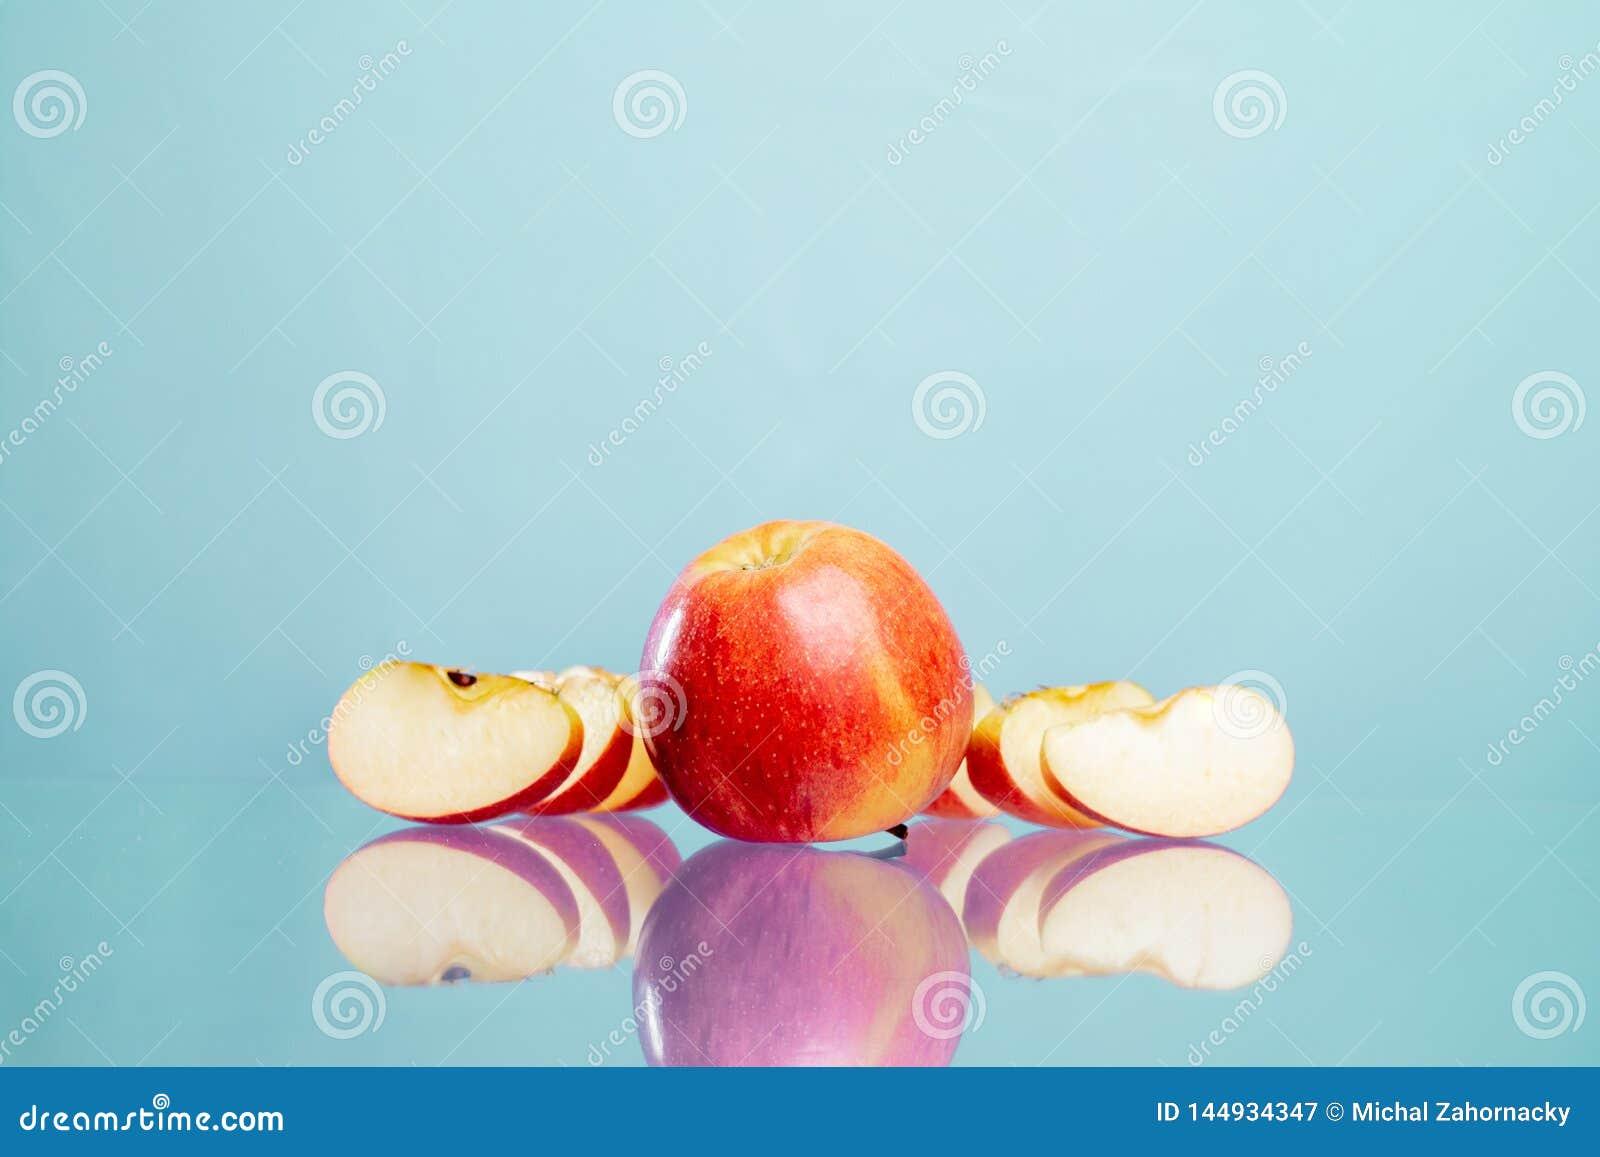 Fresco, frutti, mele affettate, mele, bio-, vitamine,